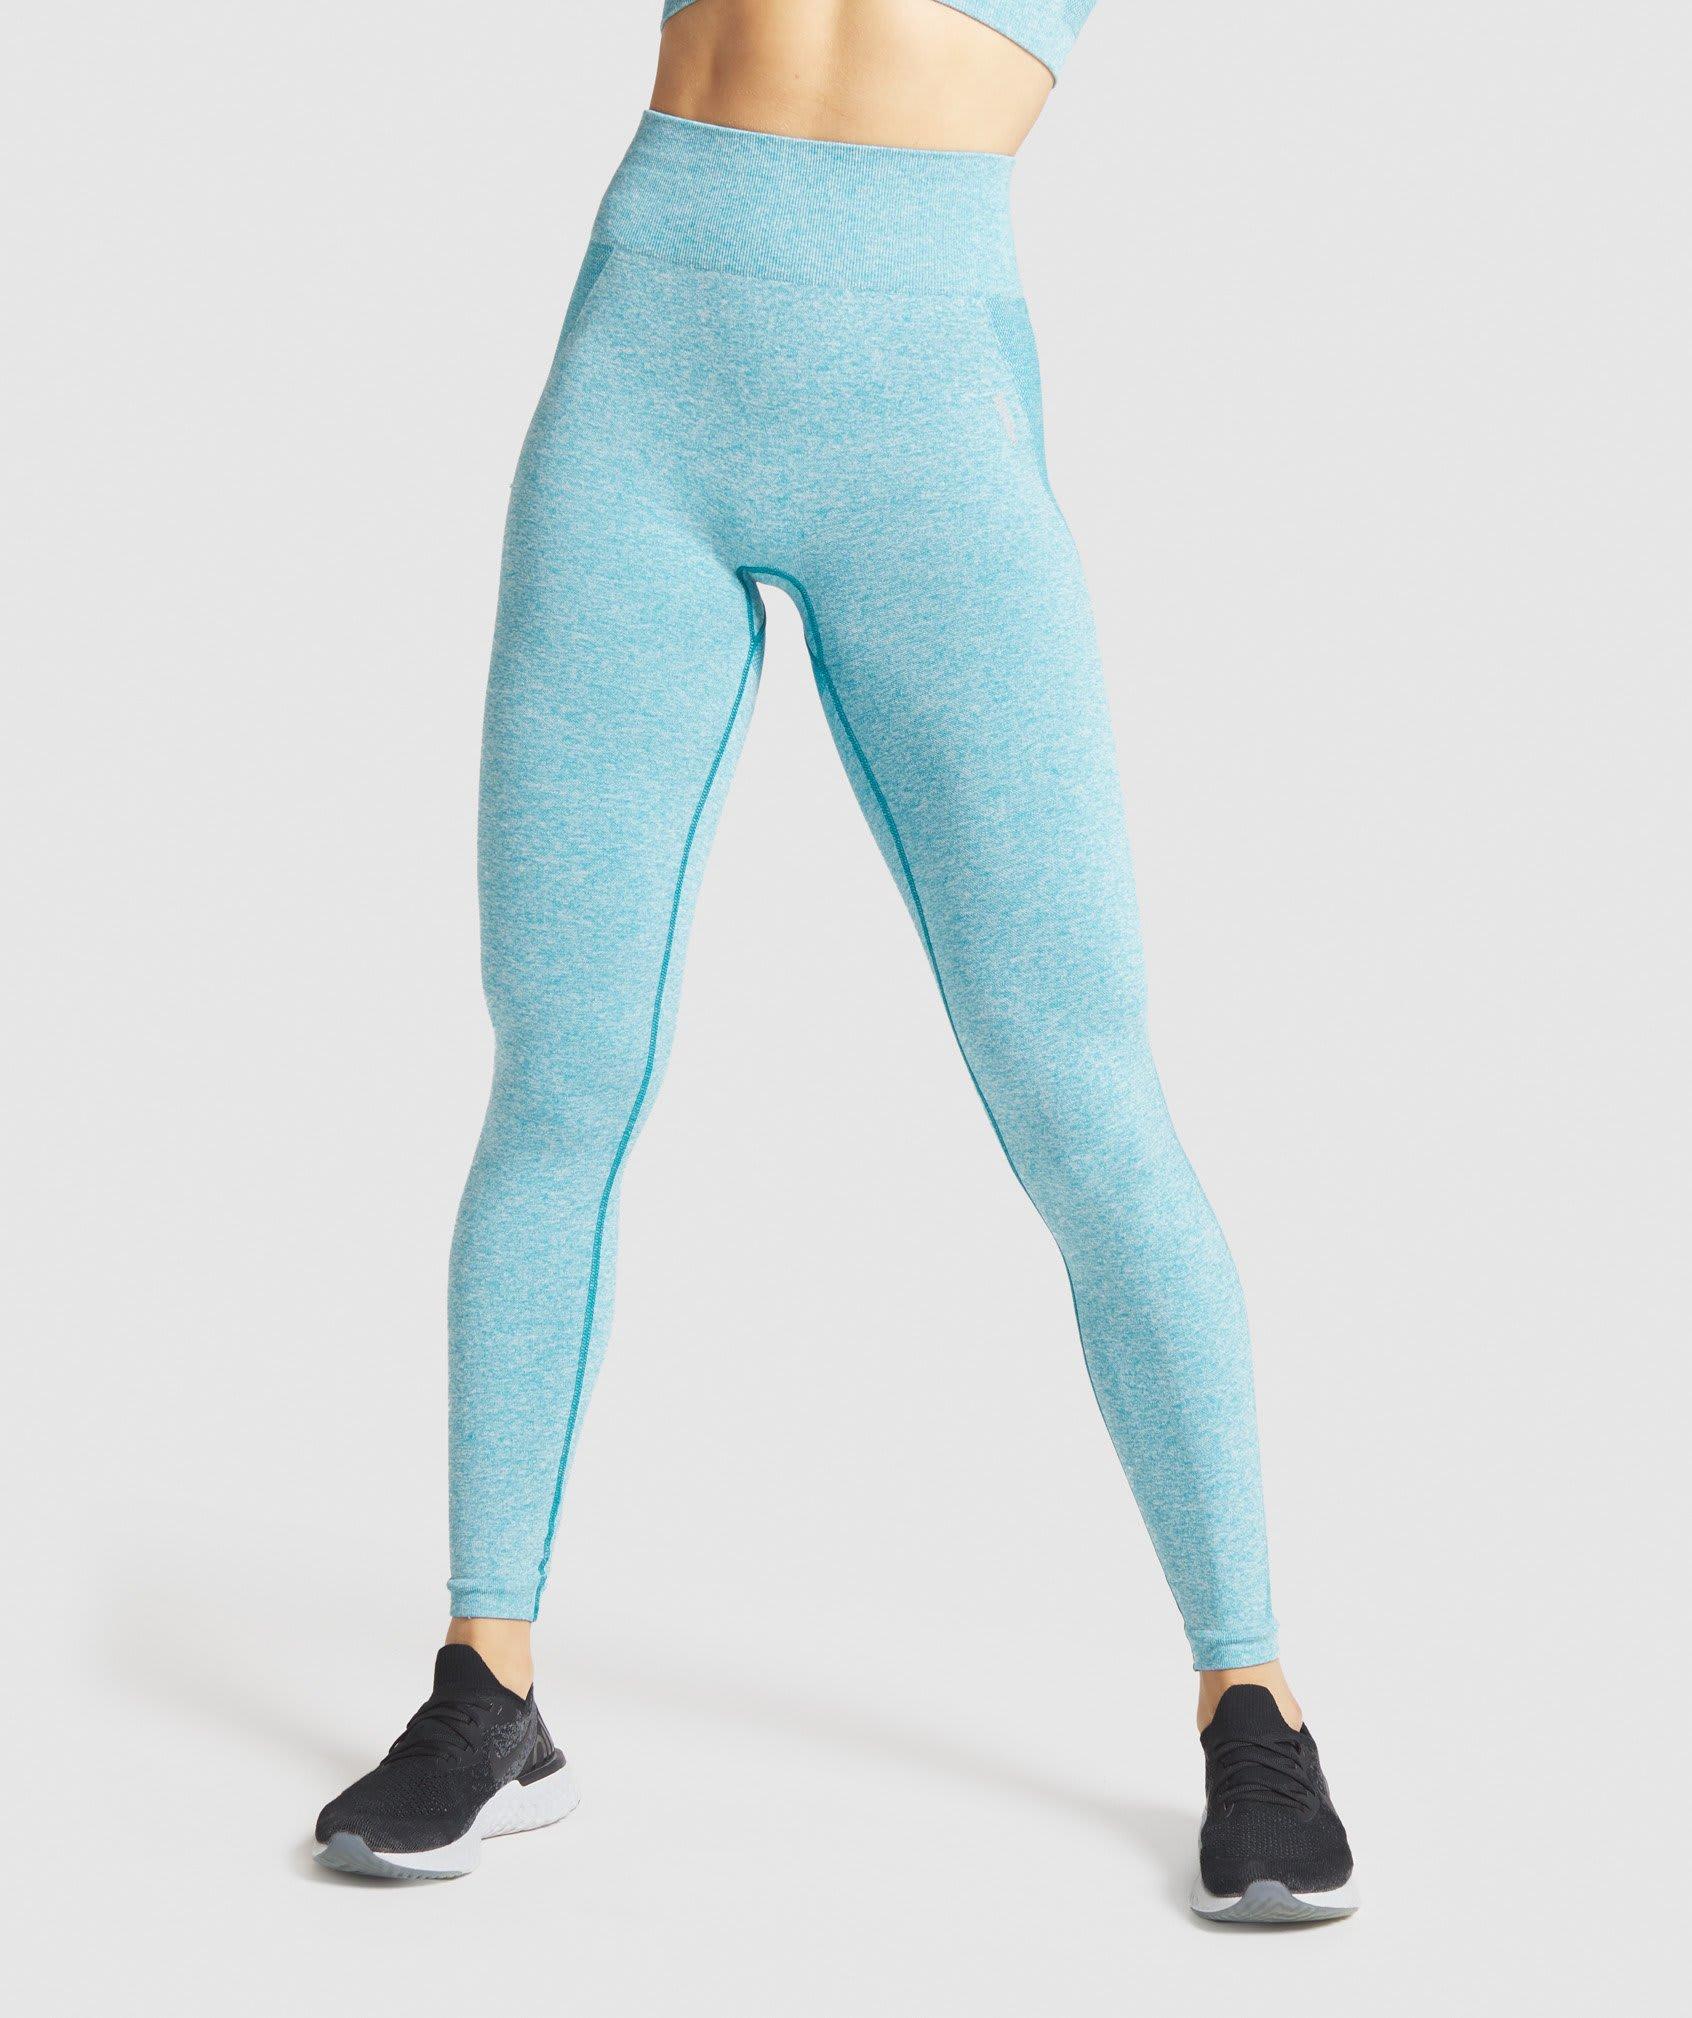 FLEX HIGH WAISTED LEGGINGS by GYMSHARK, available on gymshark.com for $50 Nicole Scherzinger Pants Exact Product